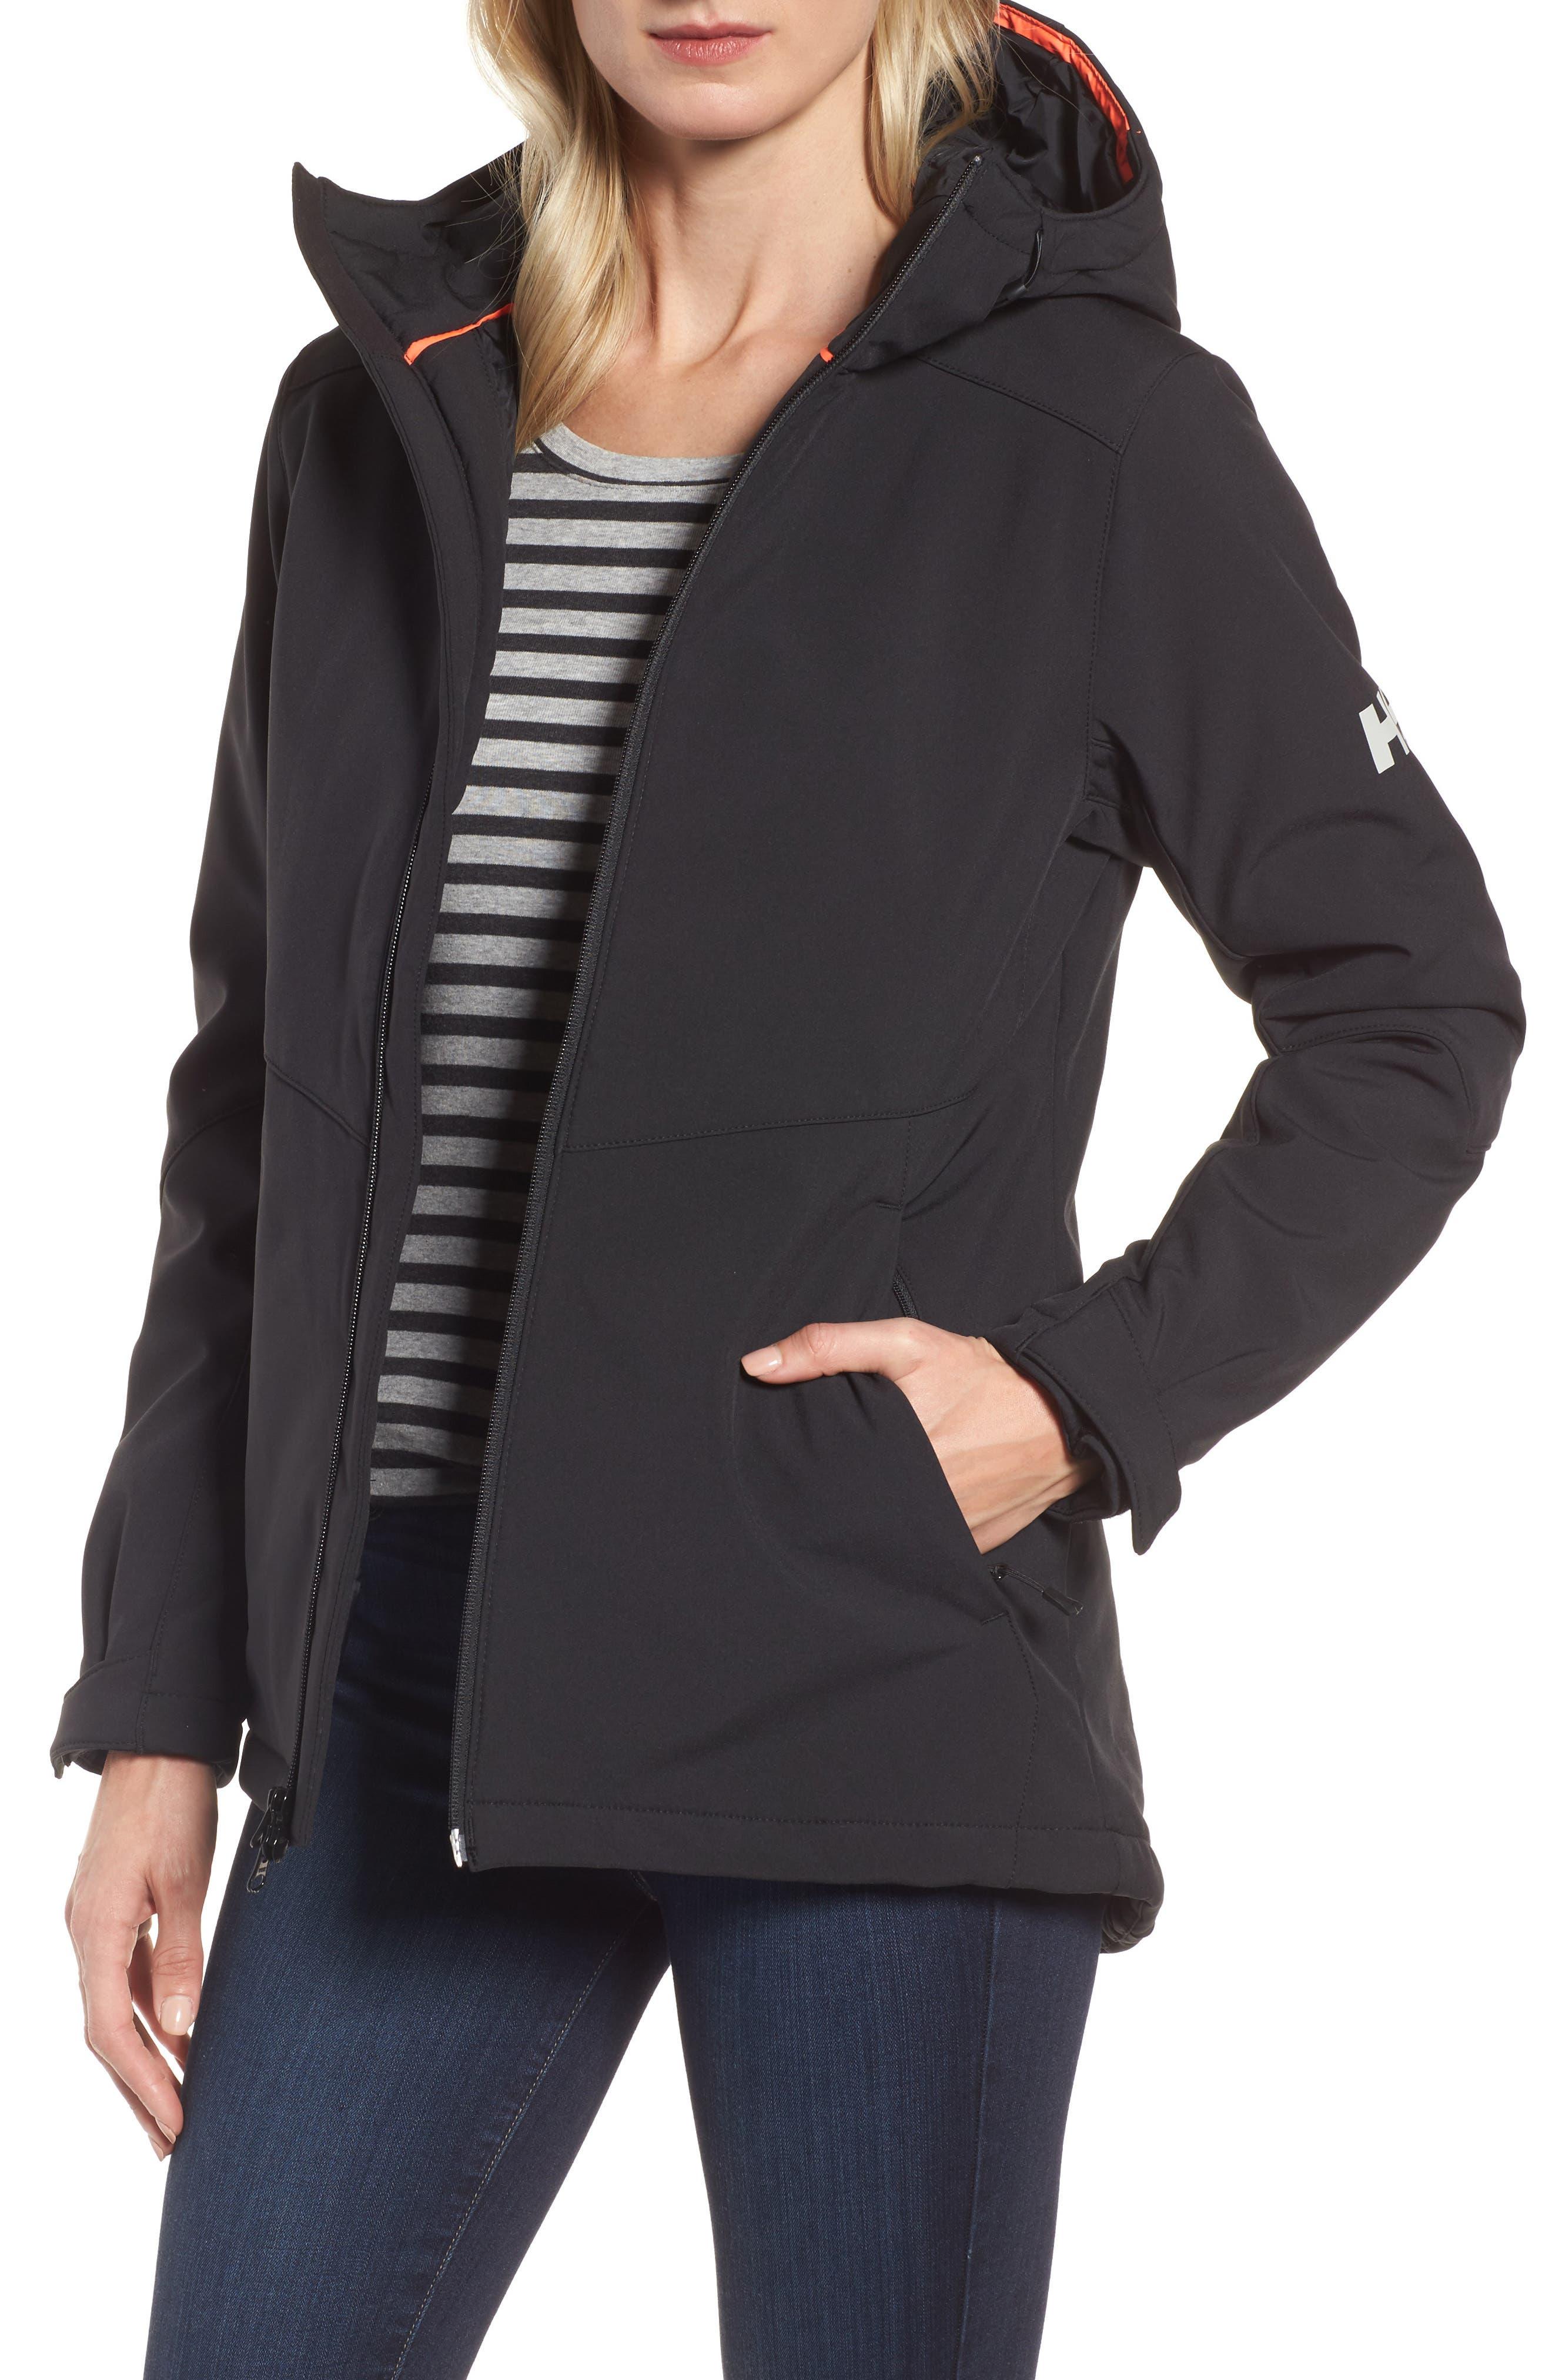 Lofn Hooded Insulated Soft Shell Jacket,                             Main thumbnail 1, color,                             Black